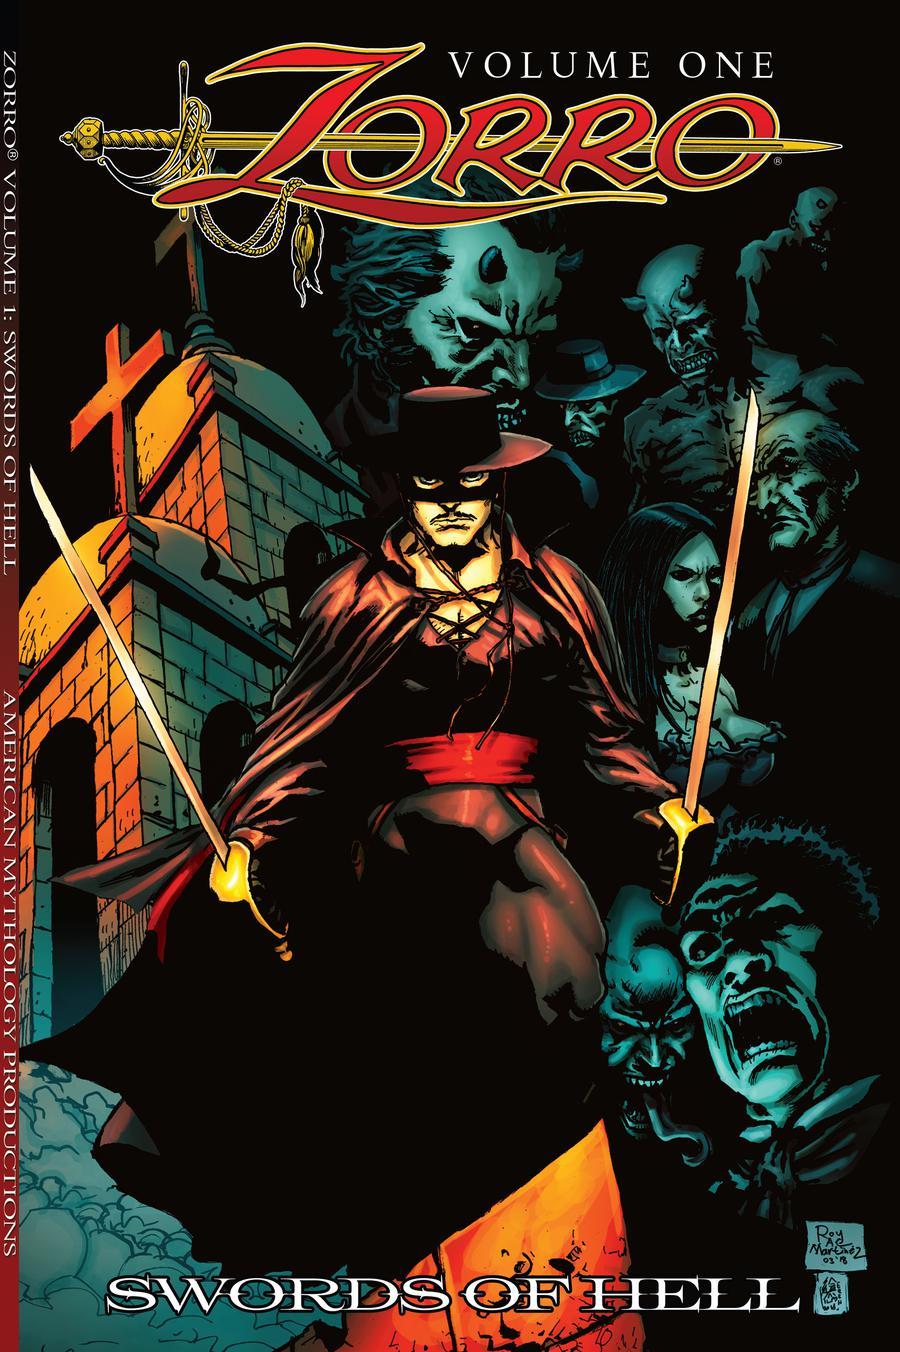 Zorro Vol 1 Swords Of Hell TP